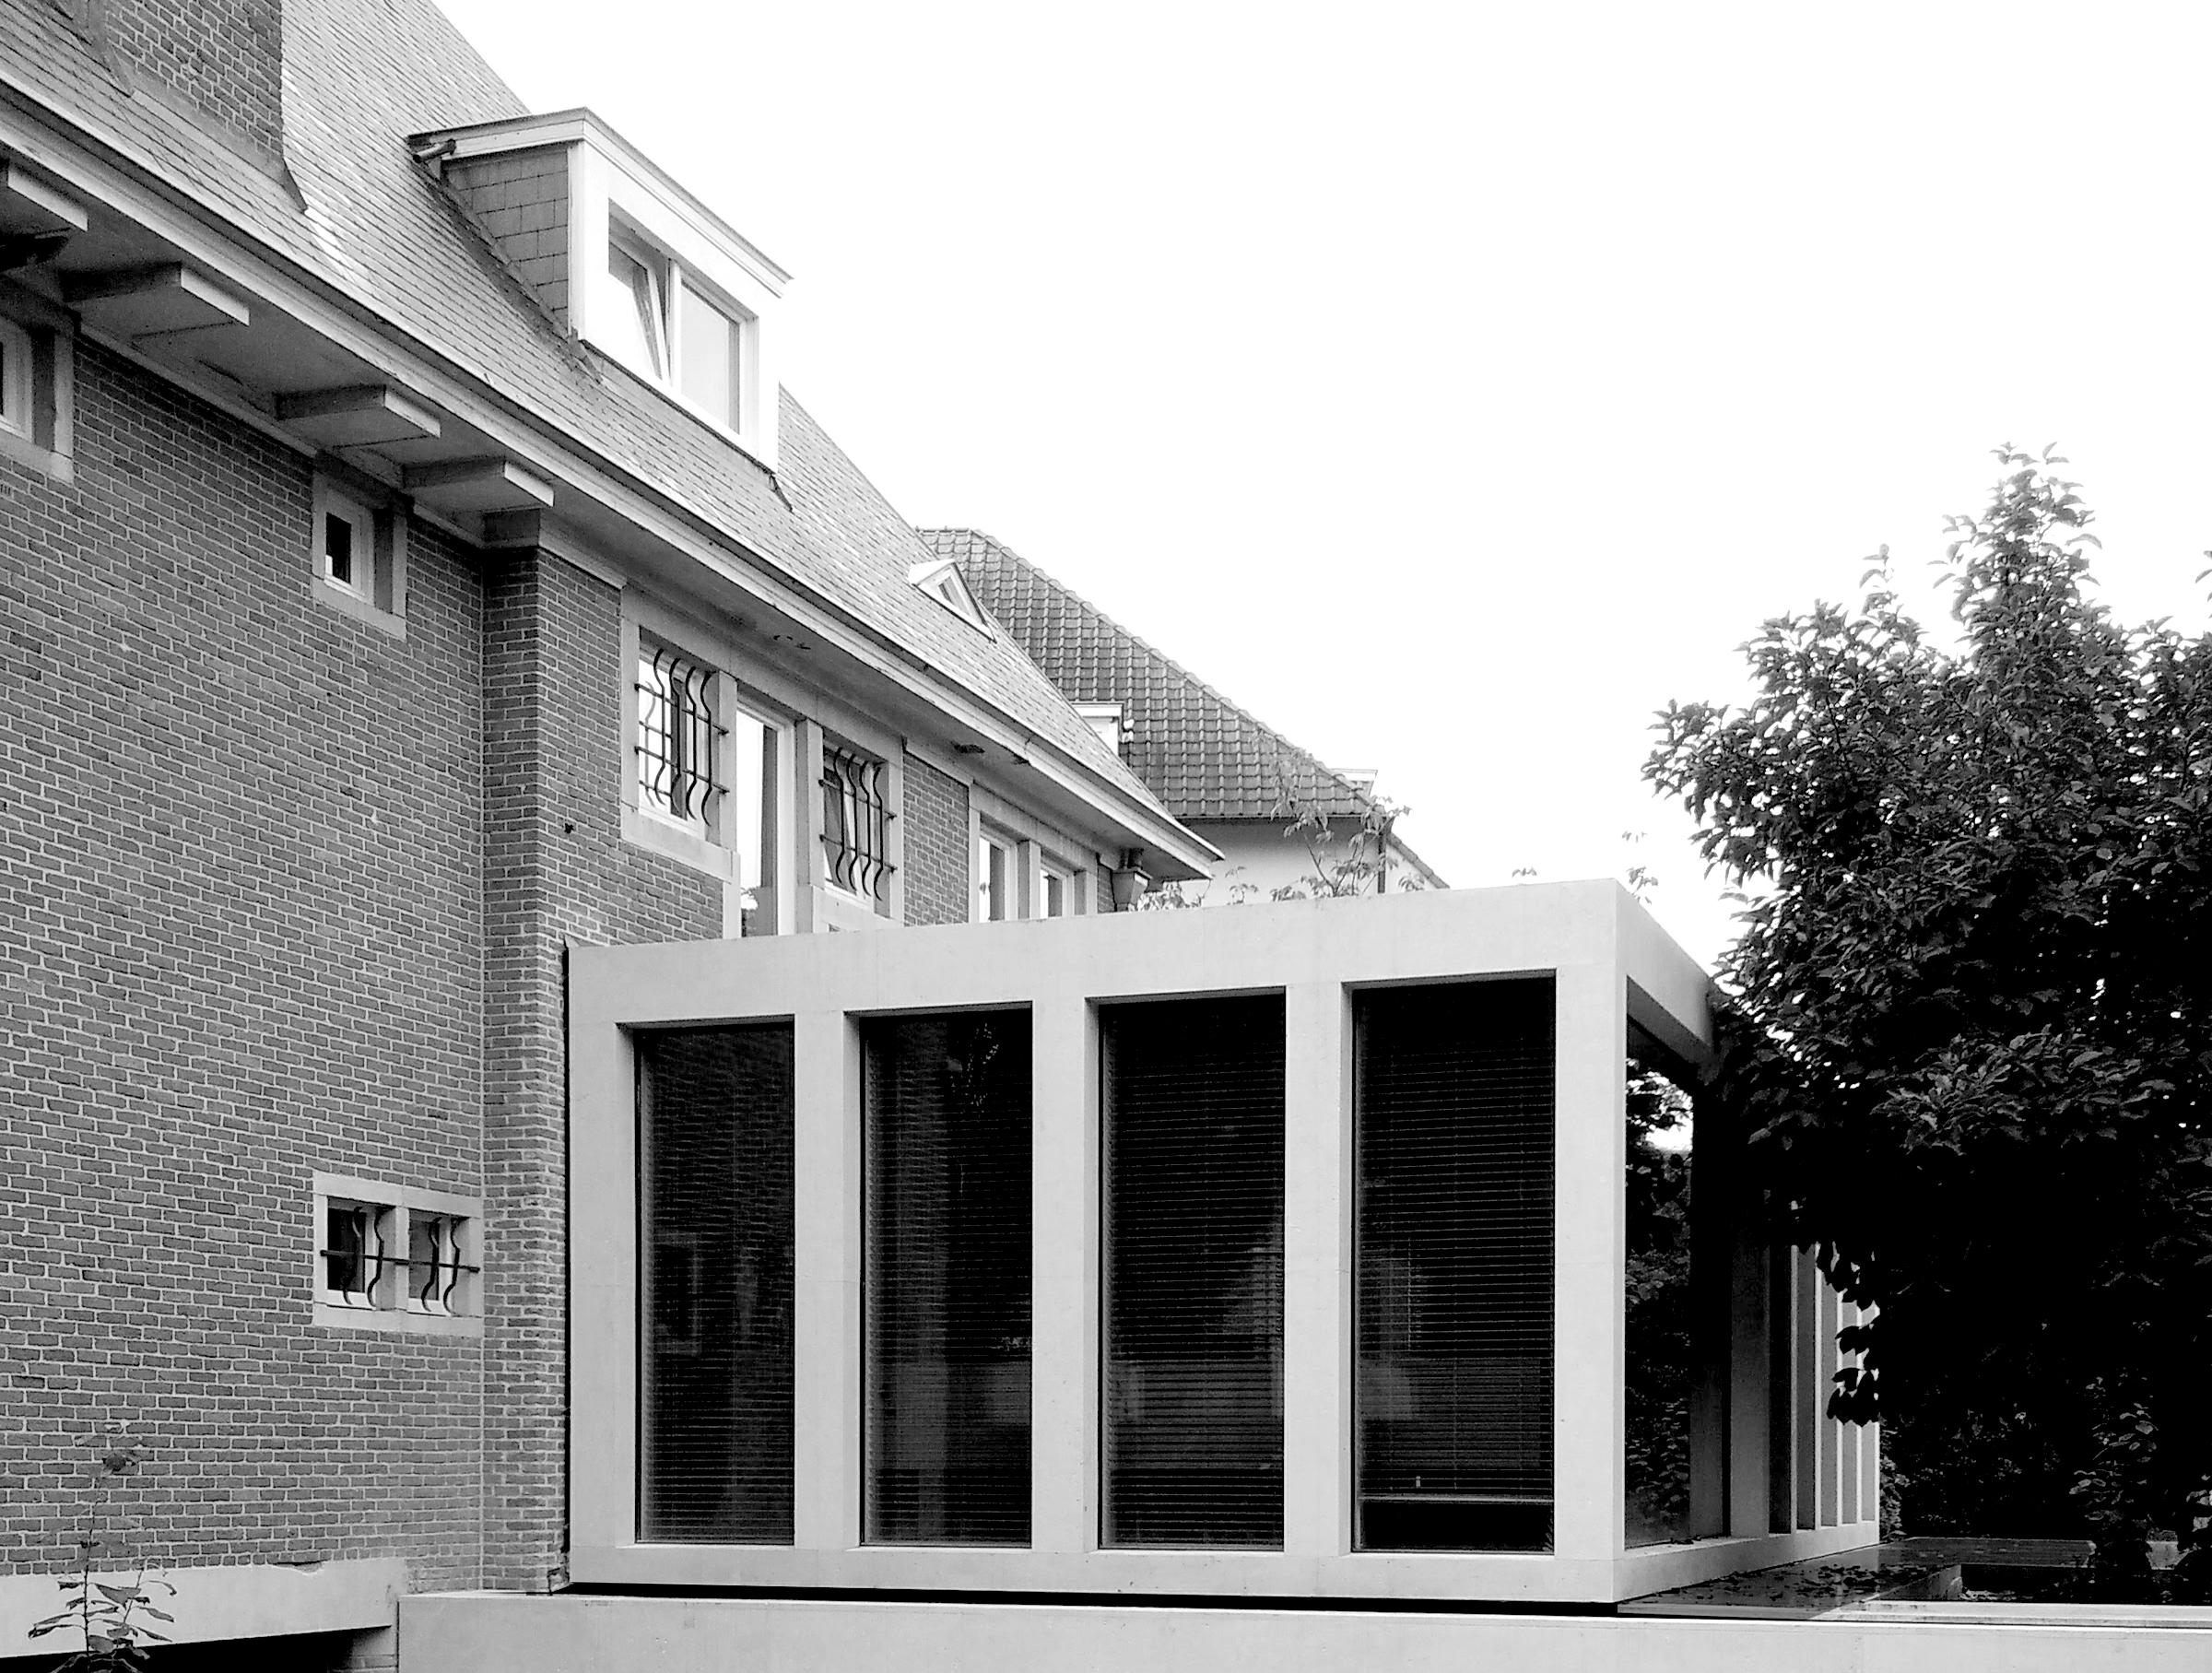 Bh Residence Gent 01C By Vvda